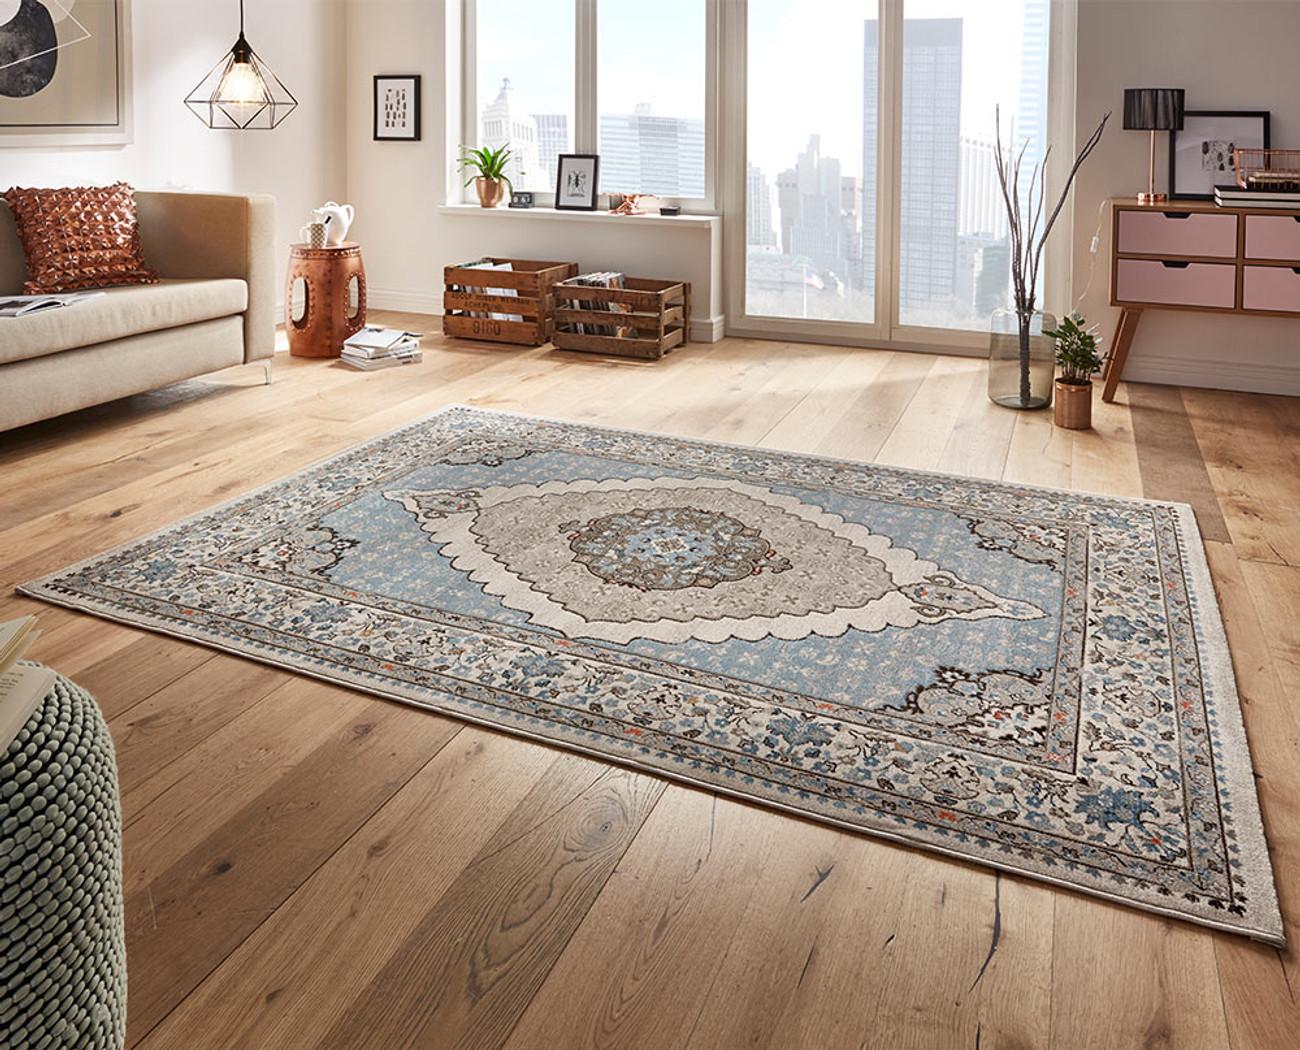 design velours teppich sign blau grau teppiche design teppiche. Black Bedroom Furniture Sets. Home Design Ideas